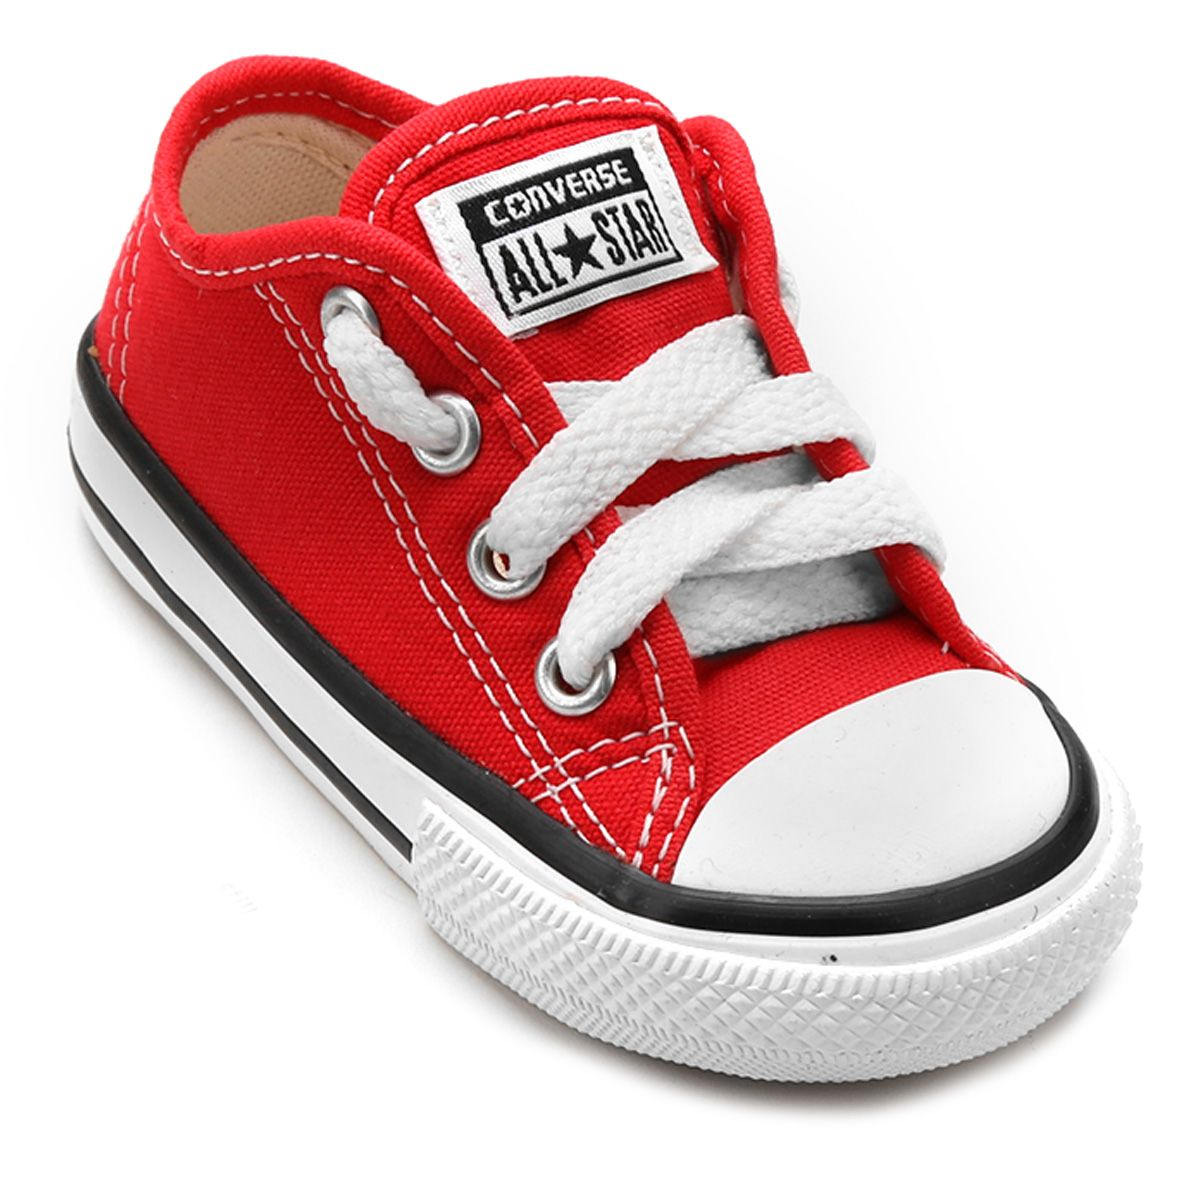 Tênis Infantil Converse All Star Chuck Taylor Border Baby Tênis Infantil Chuck Taylors Sapato Infantil Menina